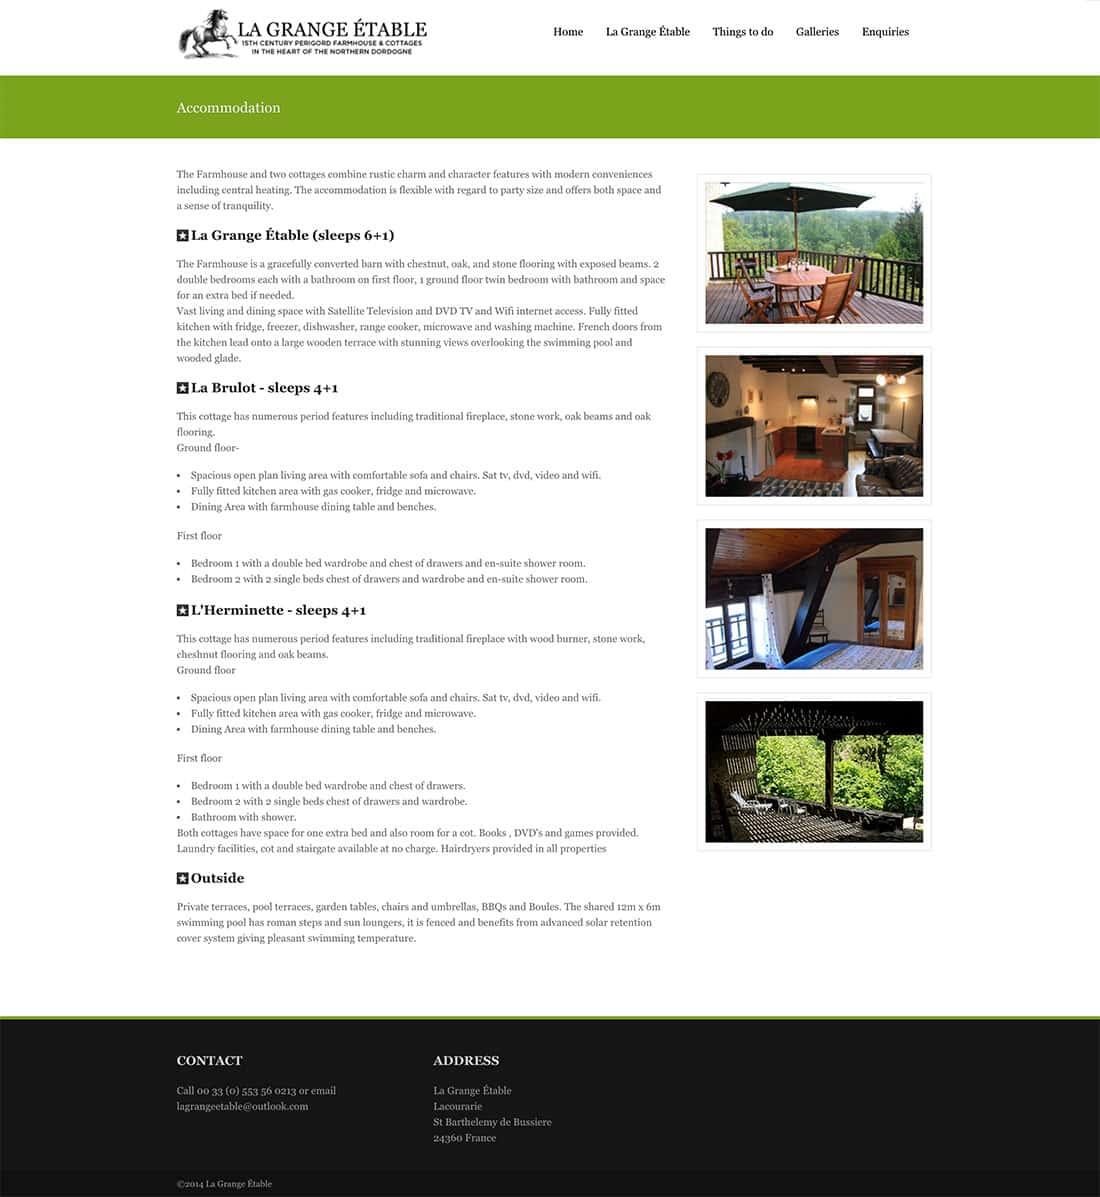 Old Design - La Grange Etable Accommodation Page